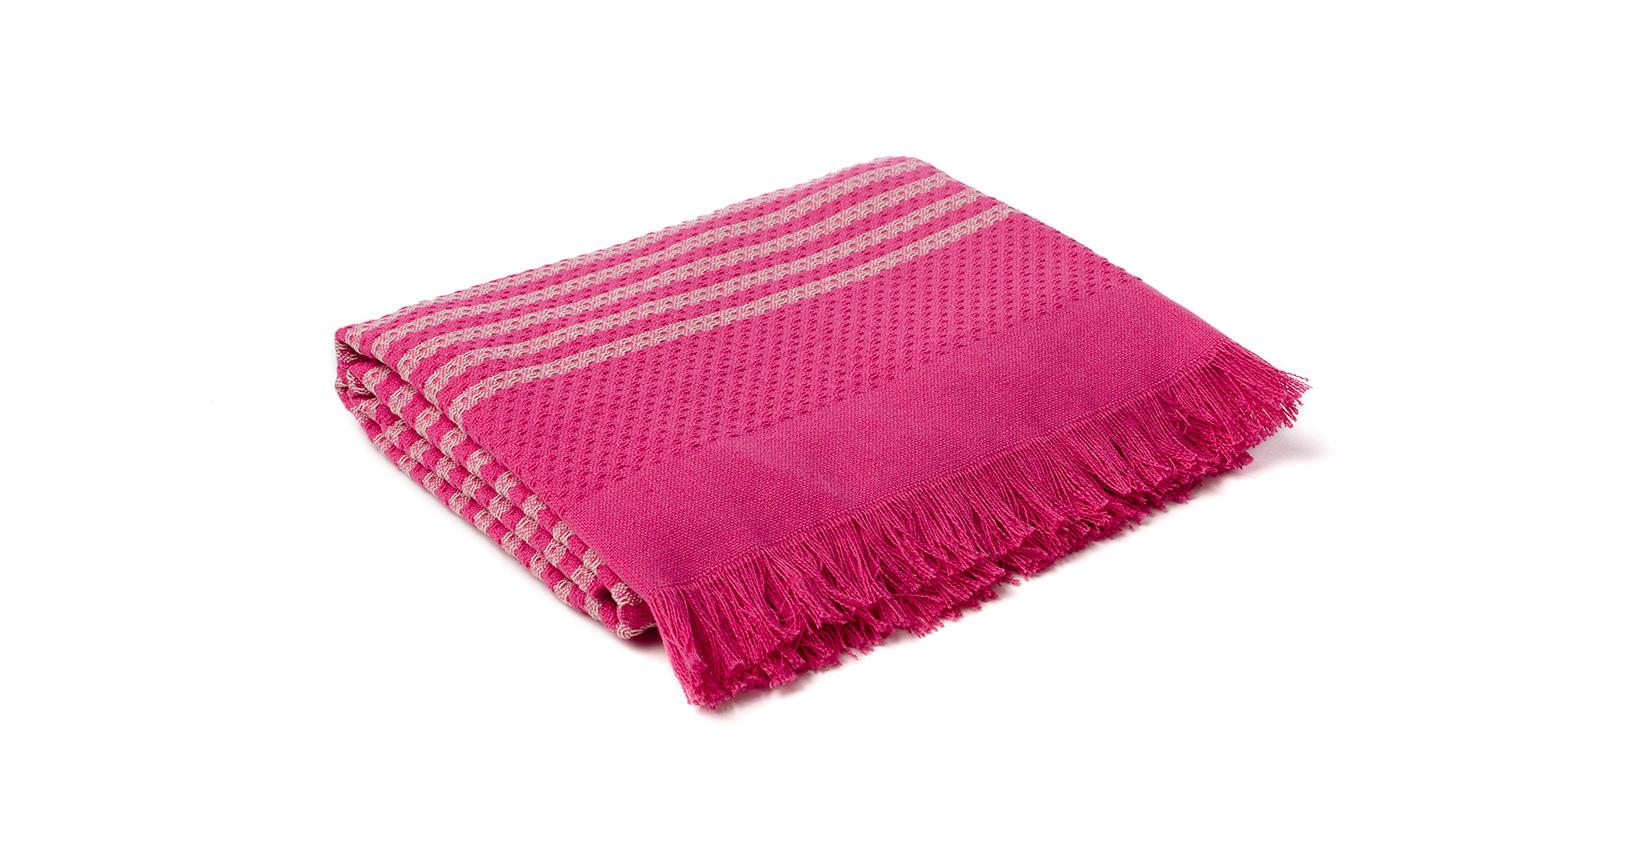 Mantas - Hammam pink | Newplaids